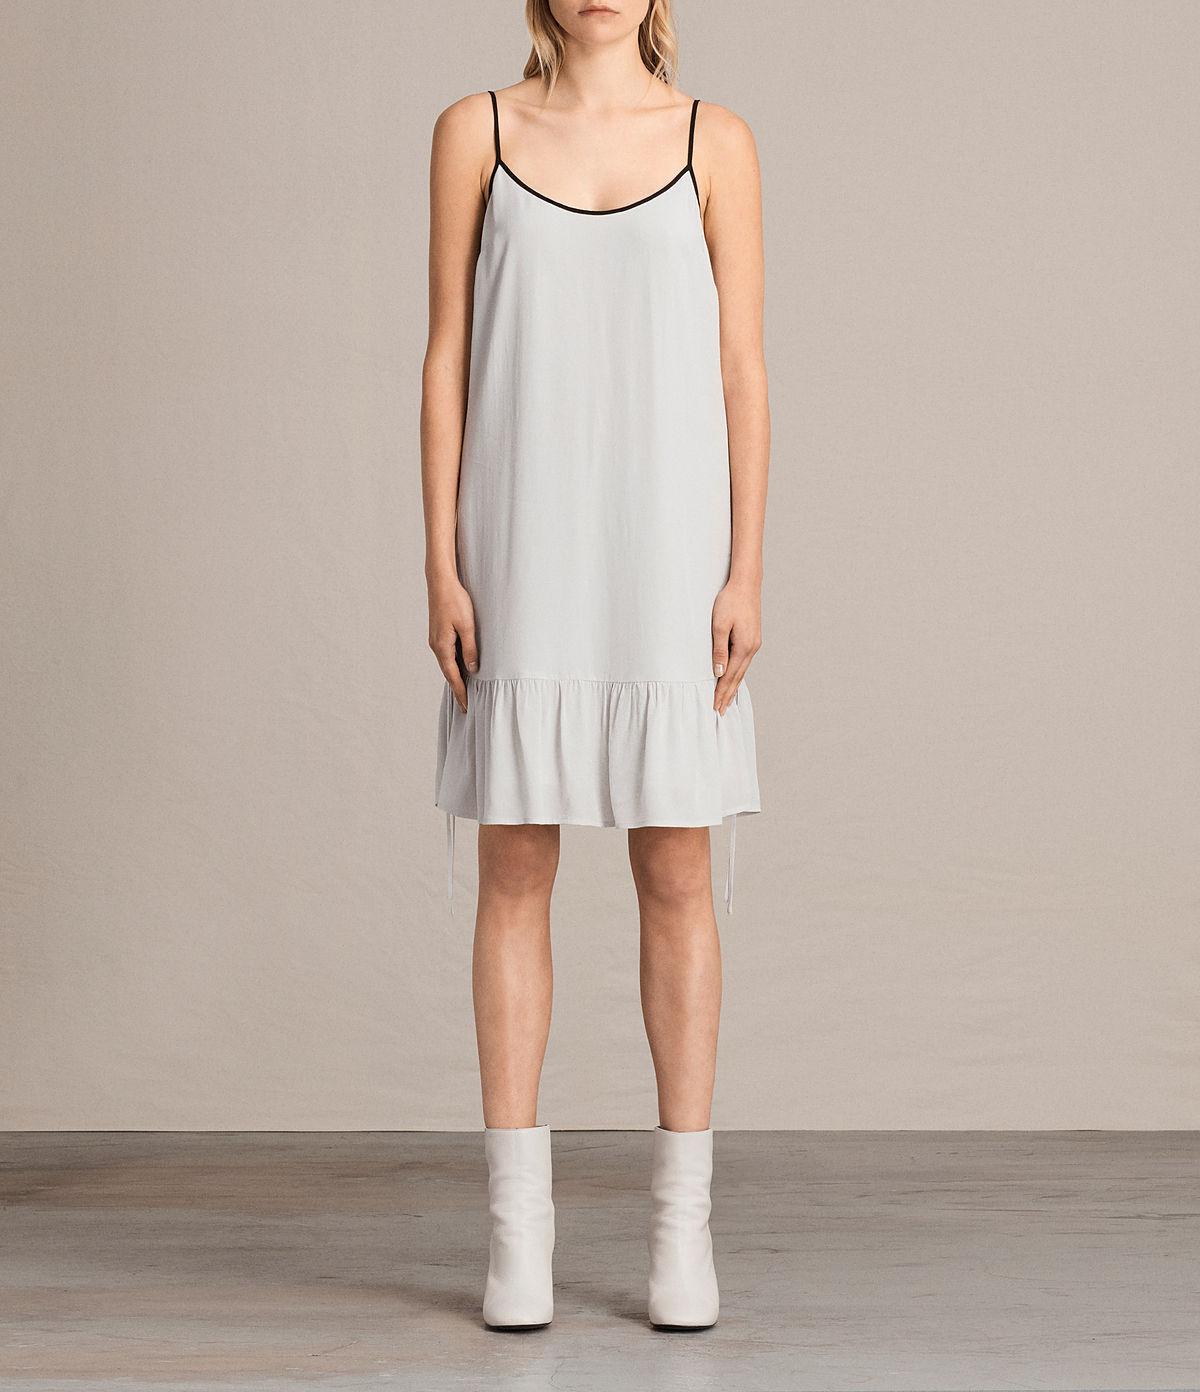 Kleider & Röcke Elima Dress